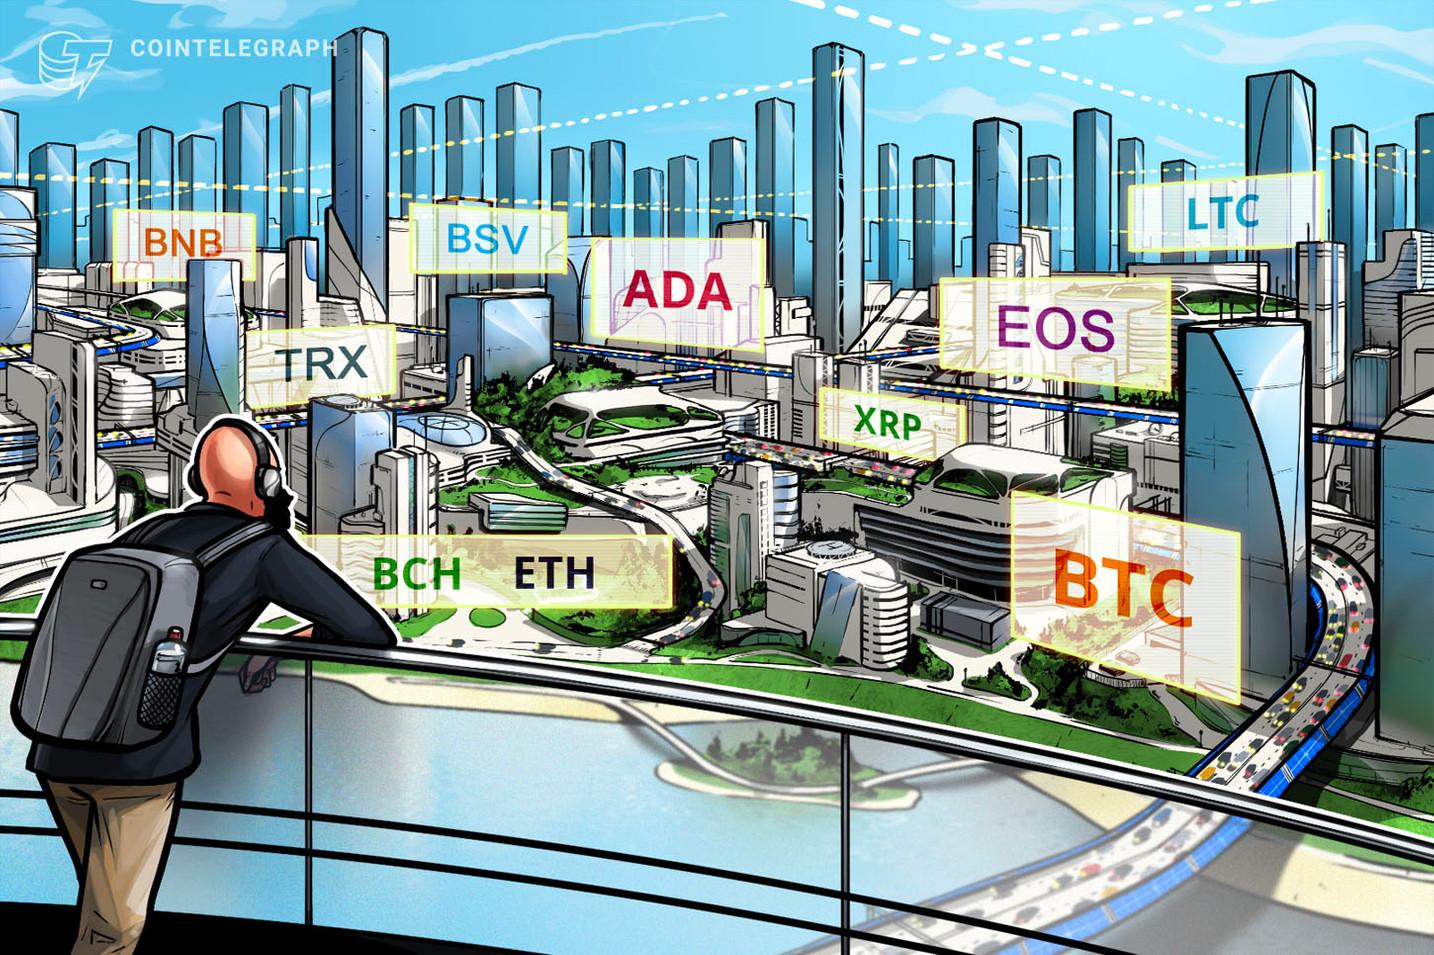 Kursanalyse, 10. Juli: BTC, ETH, XRP, BCH, LTC, EOS, BNB, BSV, TRX, ADA